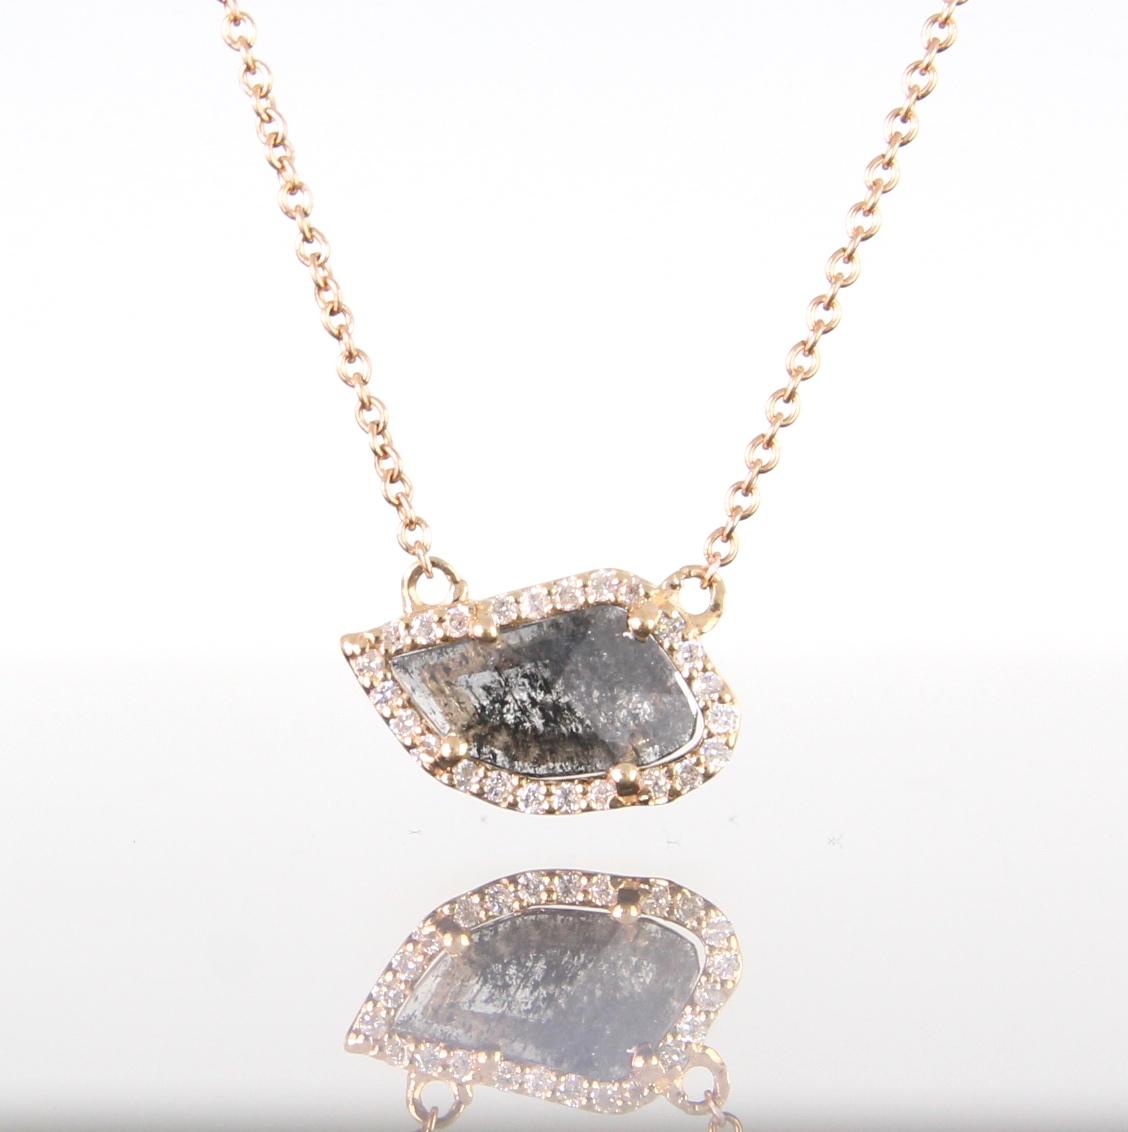 unique-natural-diamond-rough-diamond-slice-pendant-yellow-gold-fashion-jewelry-craft-revival-jewelry-store-grand-rapids